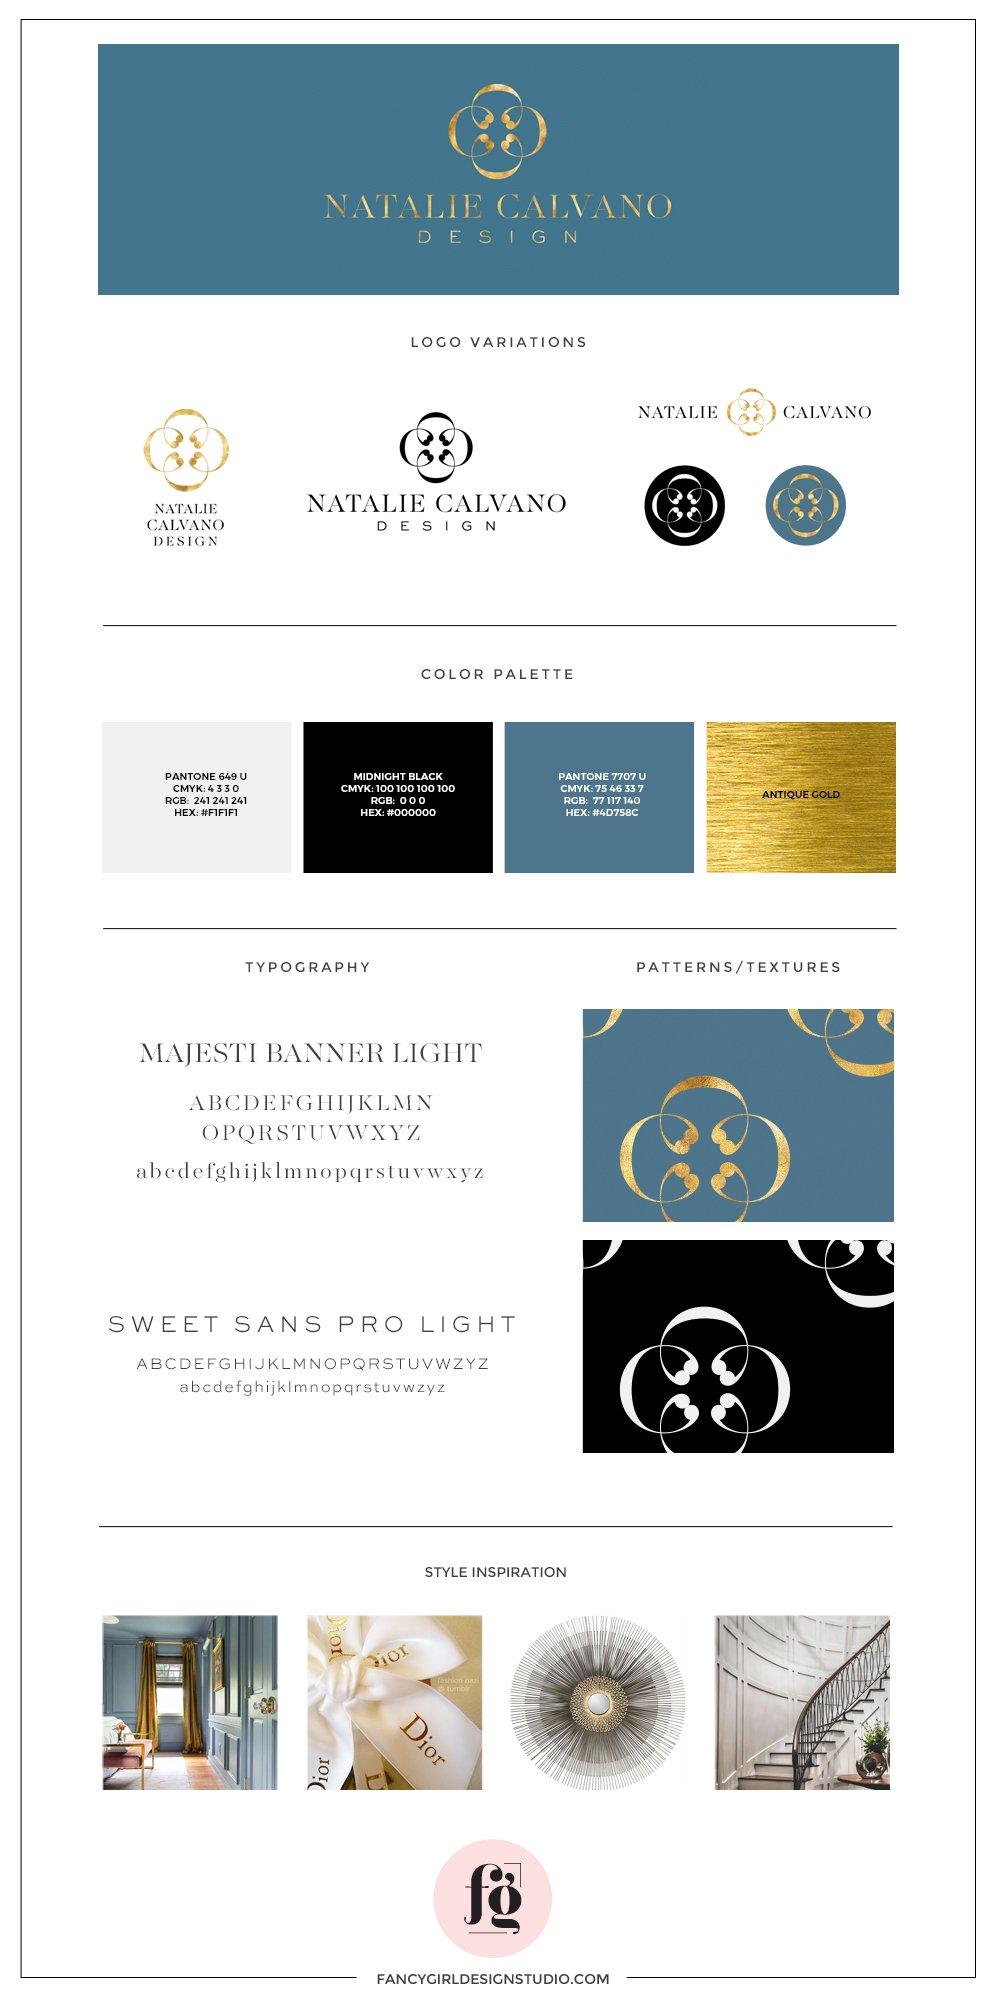 brand style guide for interior designer Natalie Calvano | by Fancy Girl Design Studio